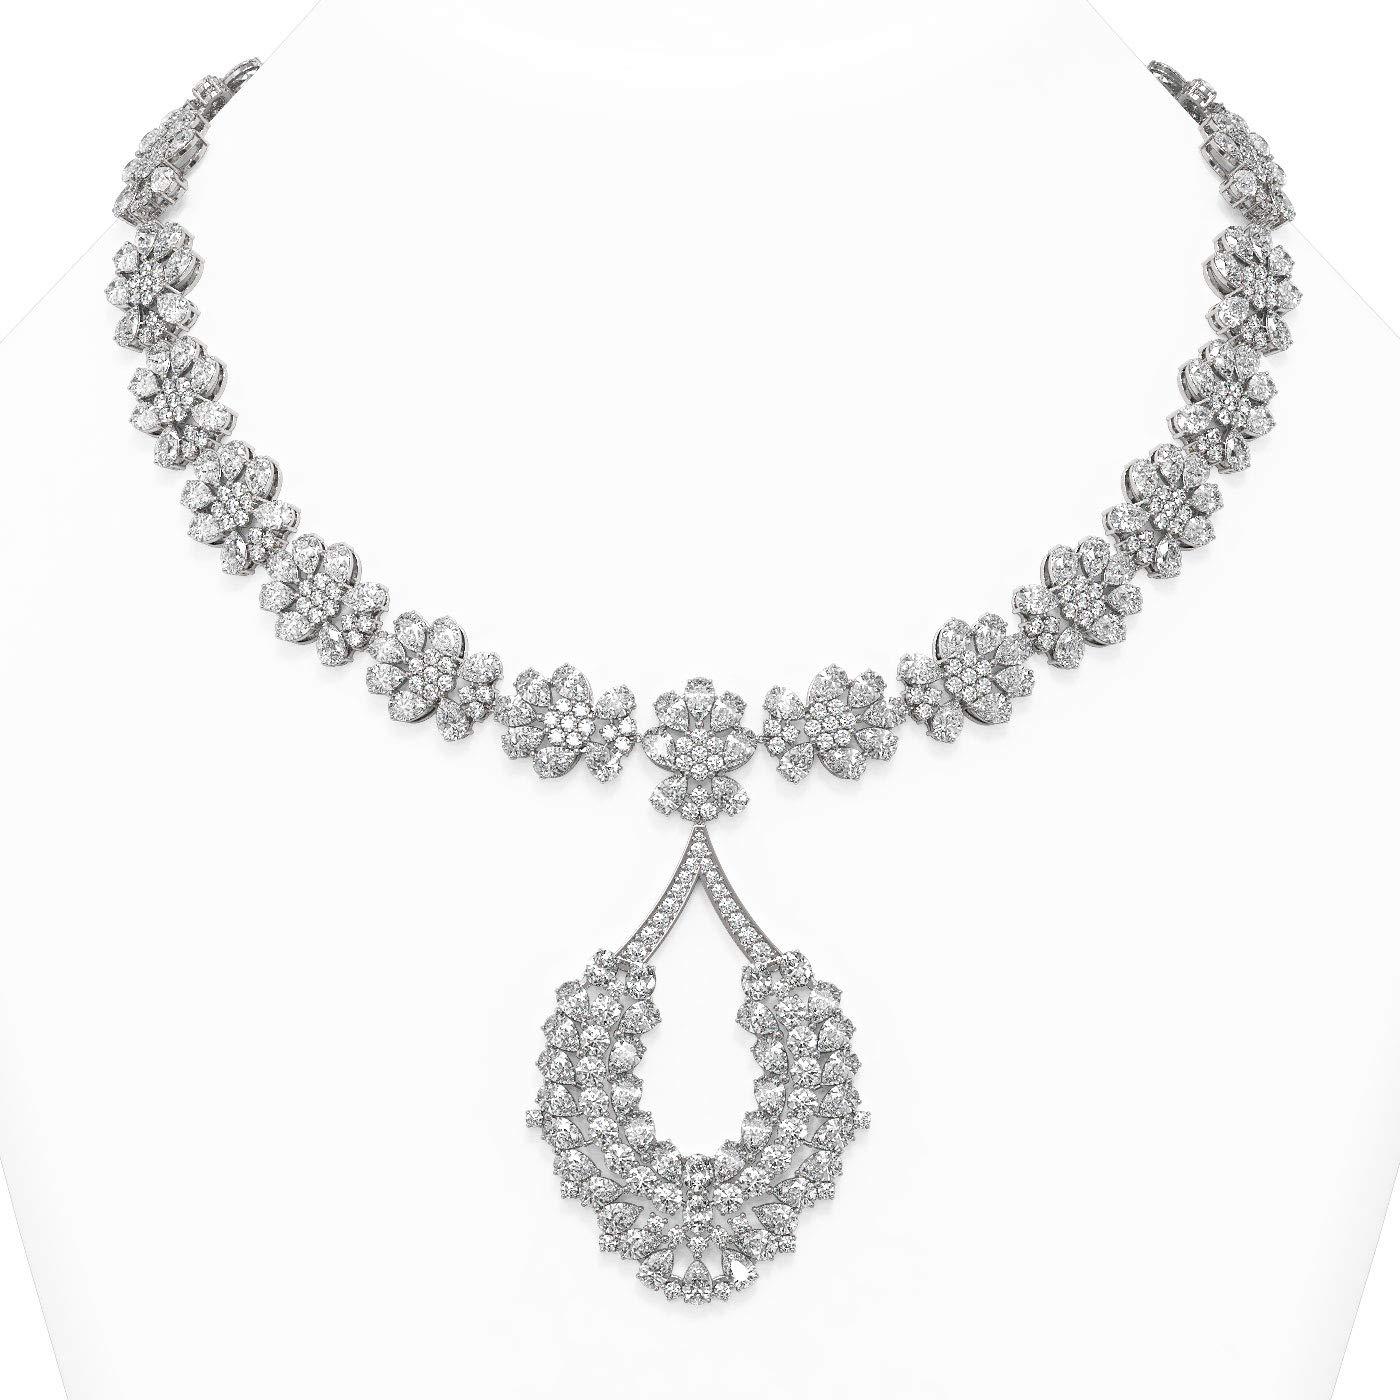 129 ctw Pear Cut Many popular brands Diamond 18K Necklace Max 69% OFF Designer